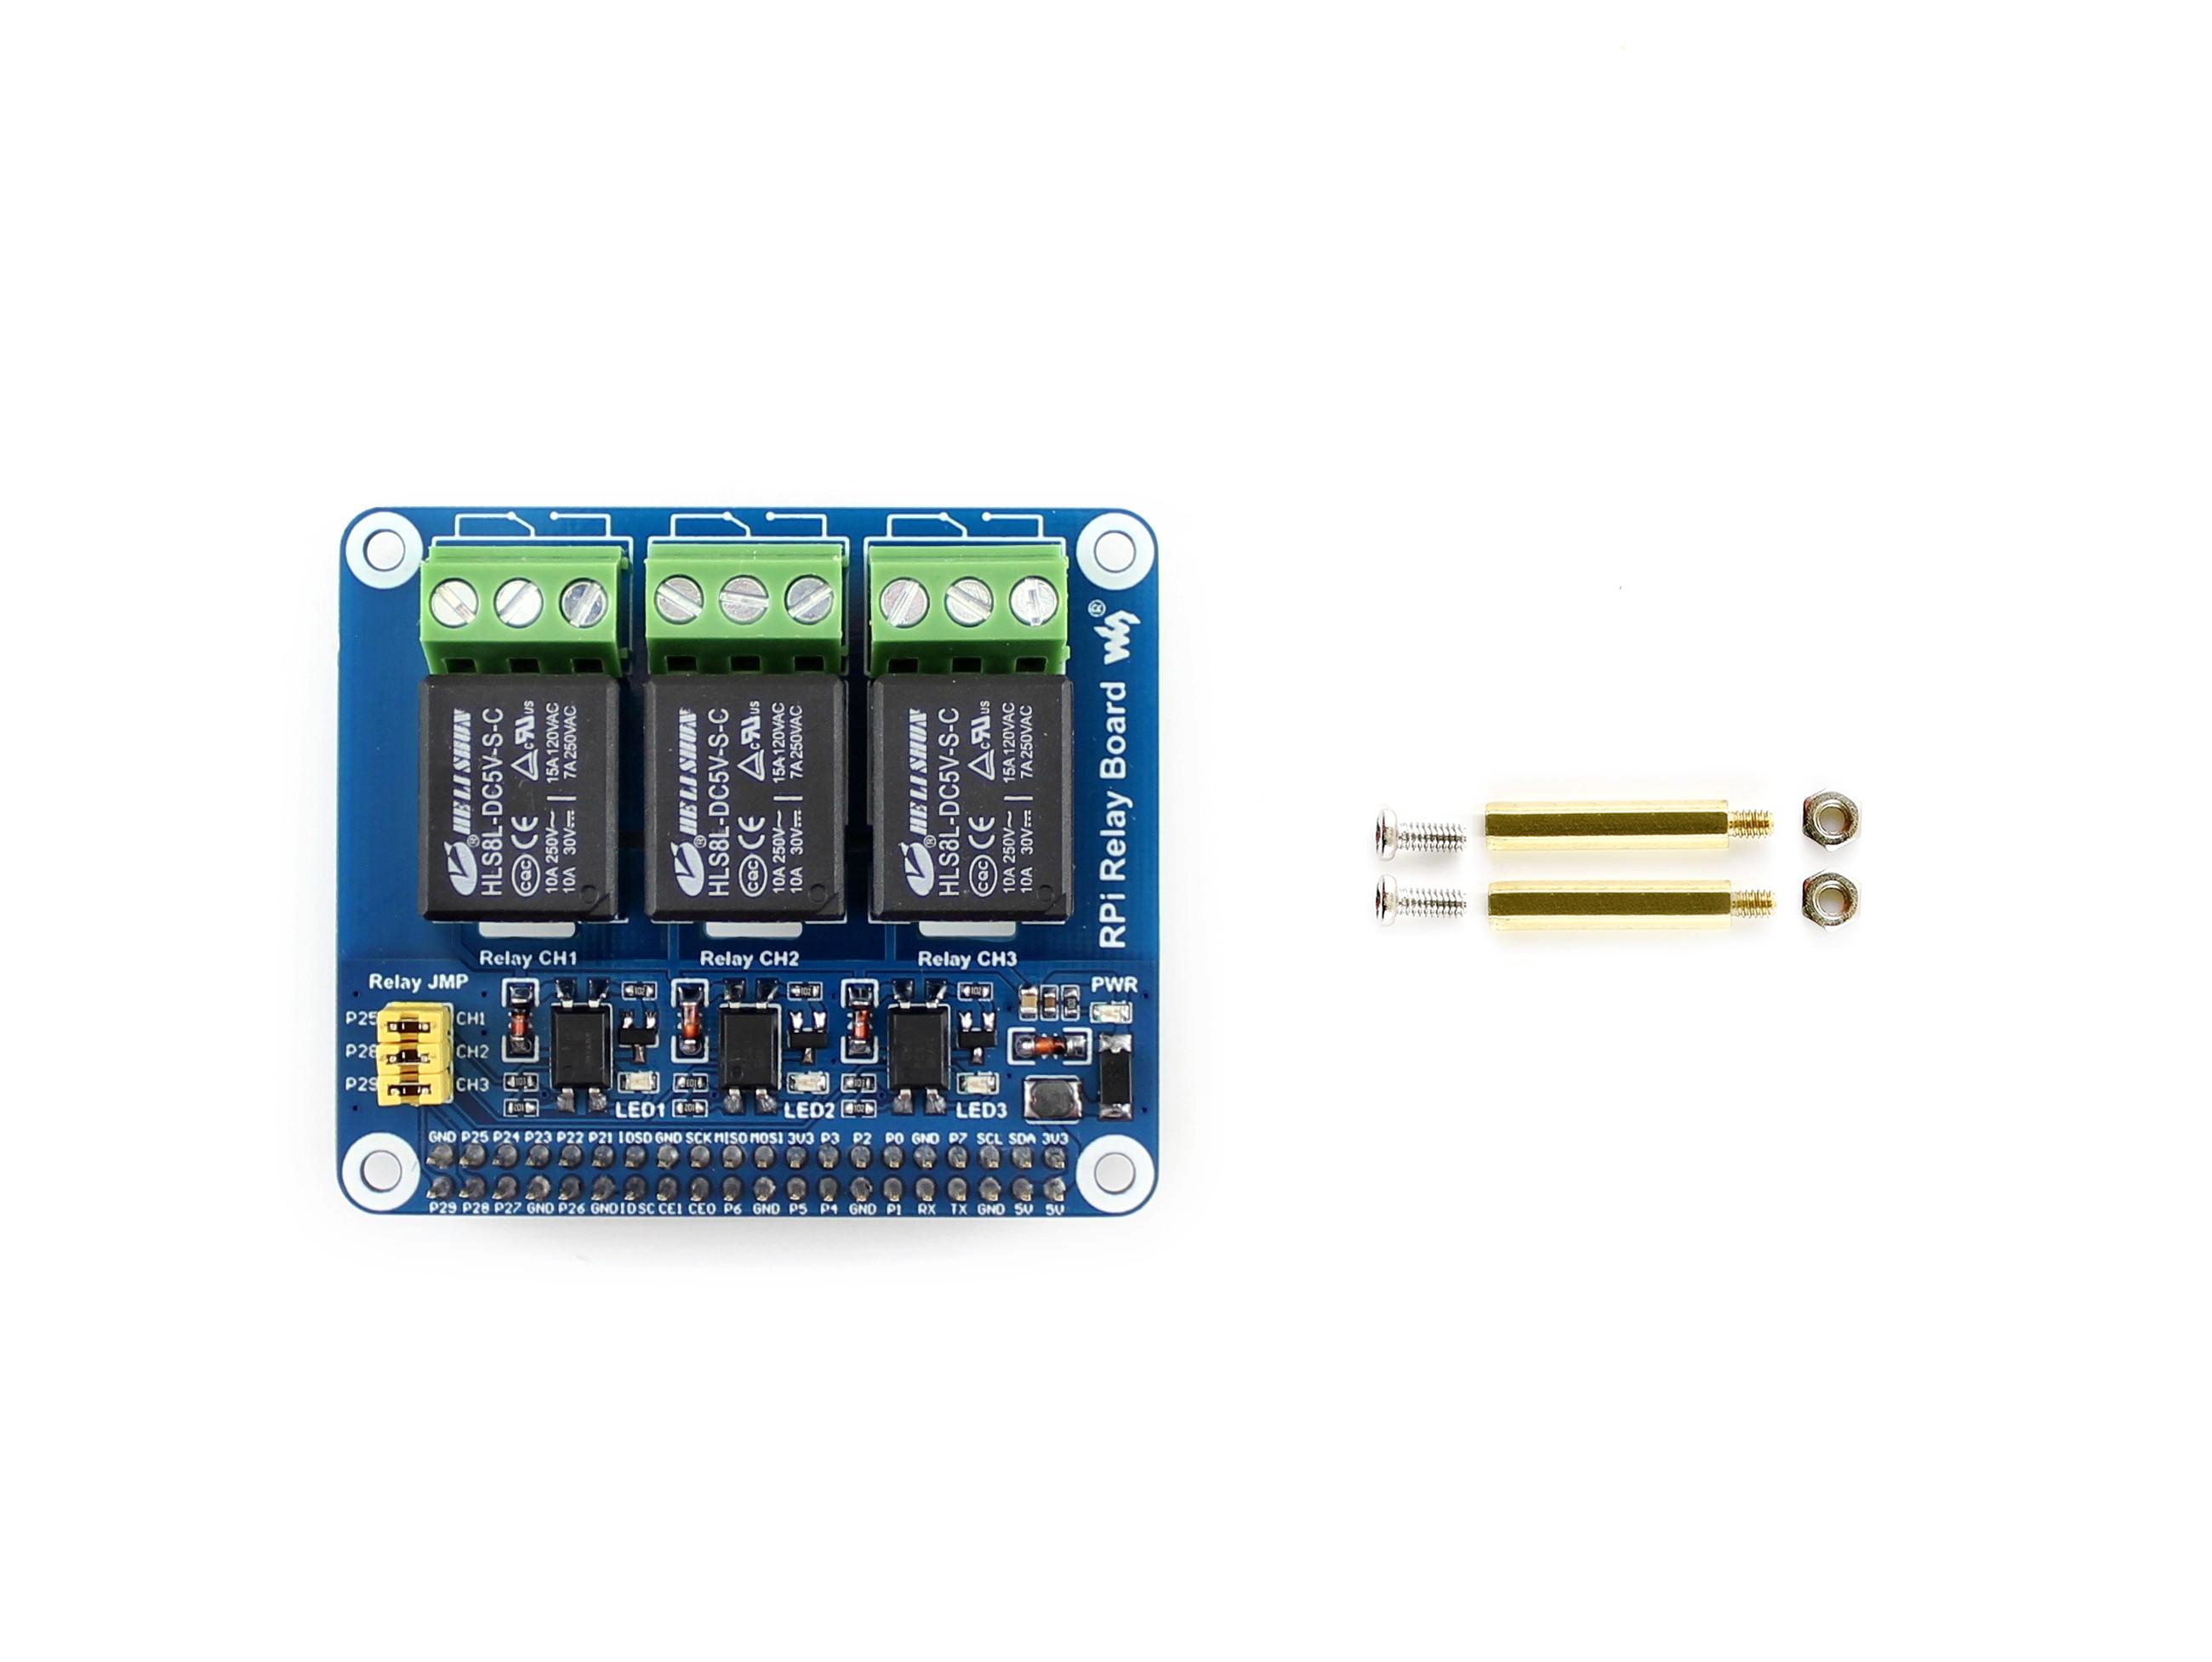 Waveshare плата реле мощности Raspberry Pi Плата расширения, для Raspberry Pi A +/B +/2B/3B/3B + для домашней автоматизации Интеллектуальная-in Доски для показов from Компьютер и офис